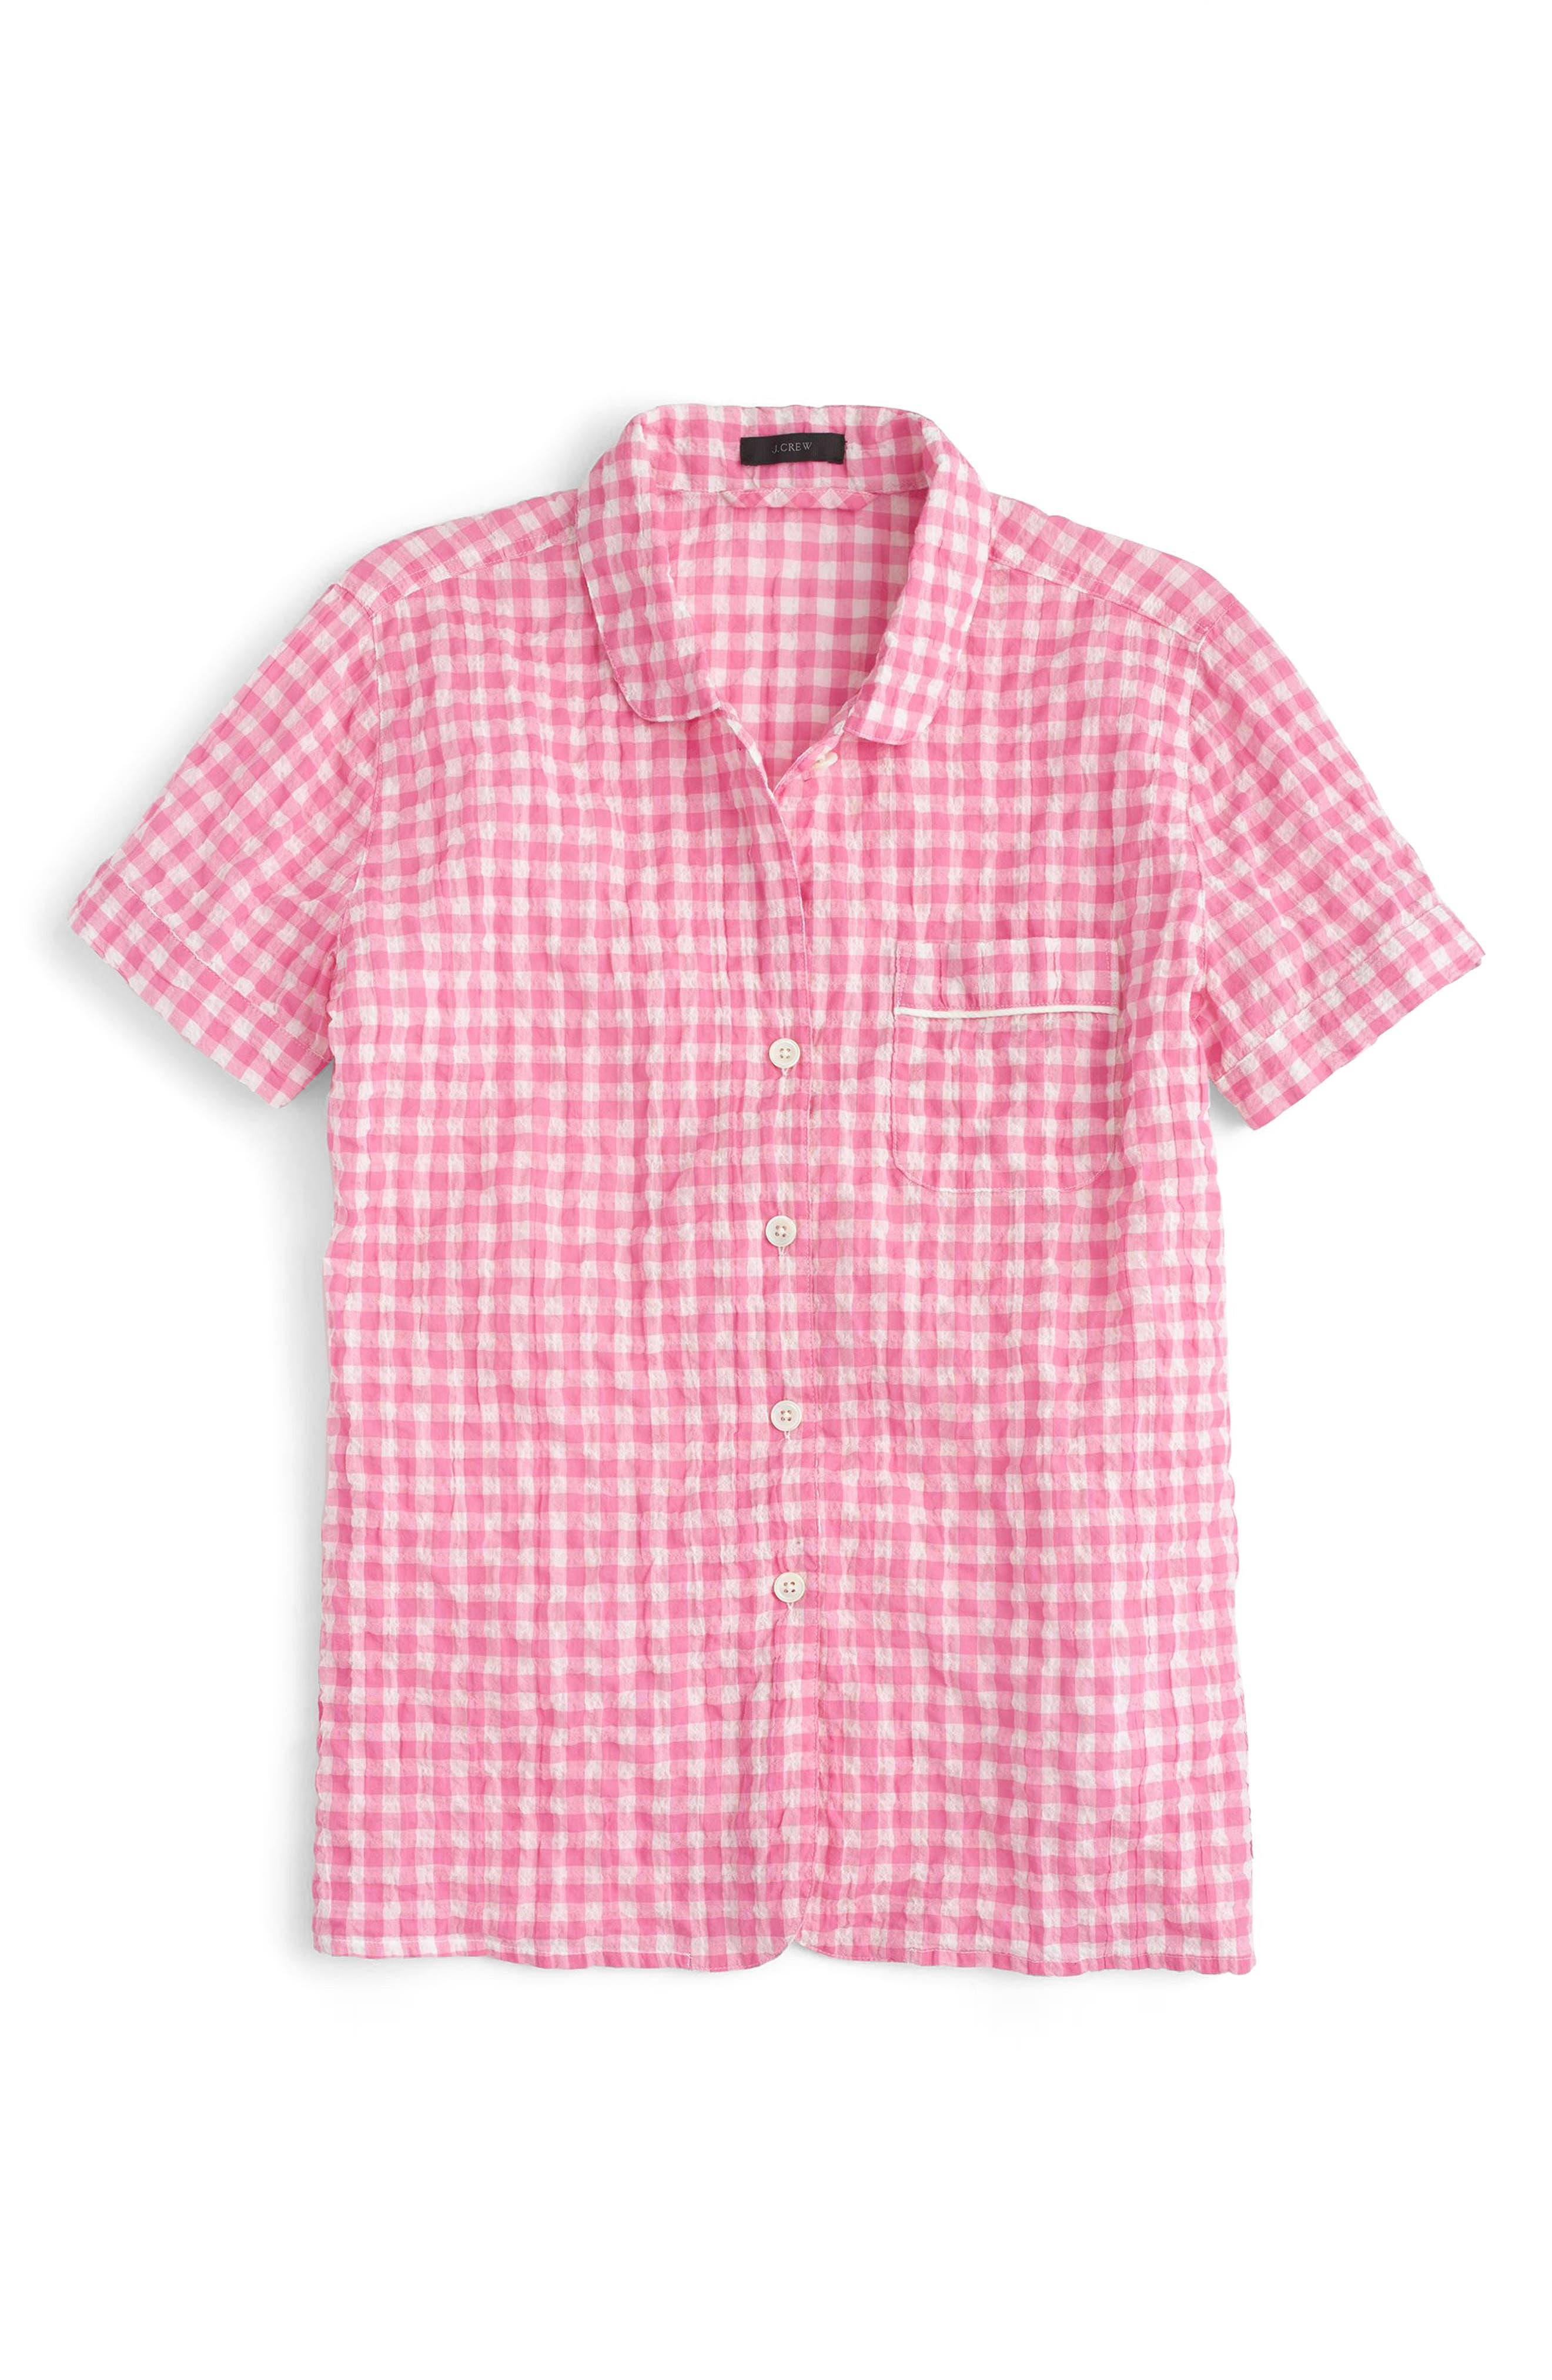 J.Crew Gingham Pajama Set,                             Alternate thumbnail 2, color,                             Ivory Pink